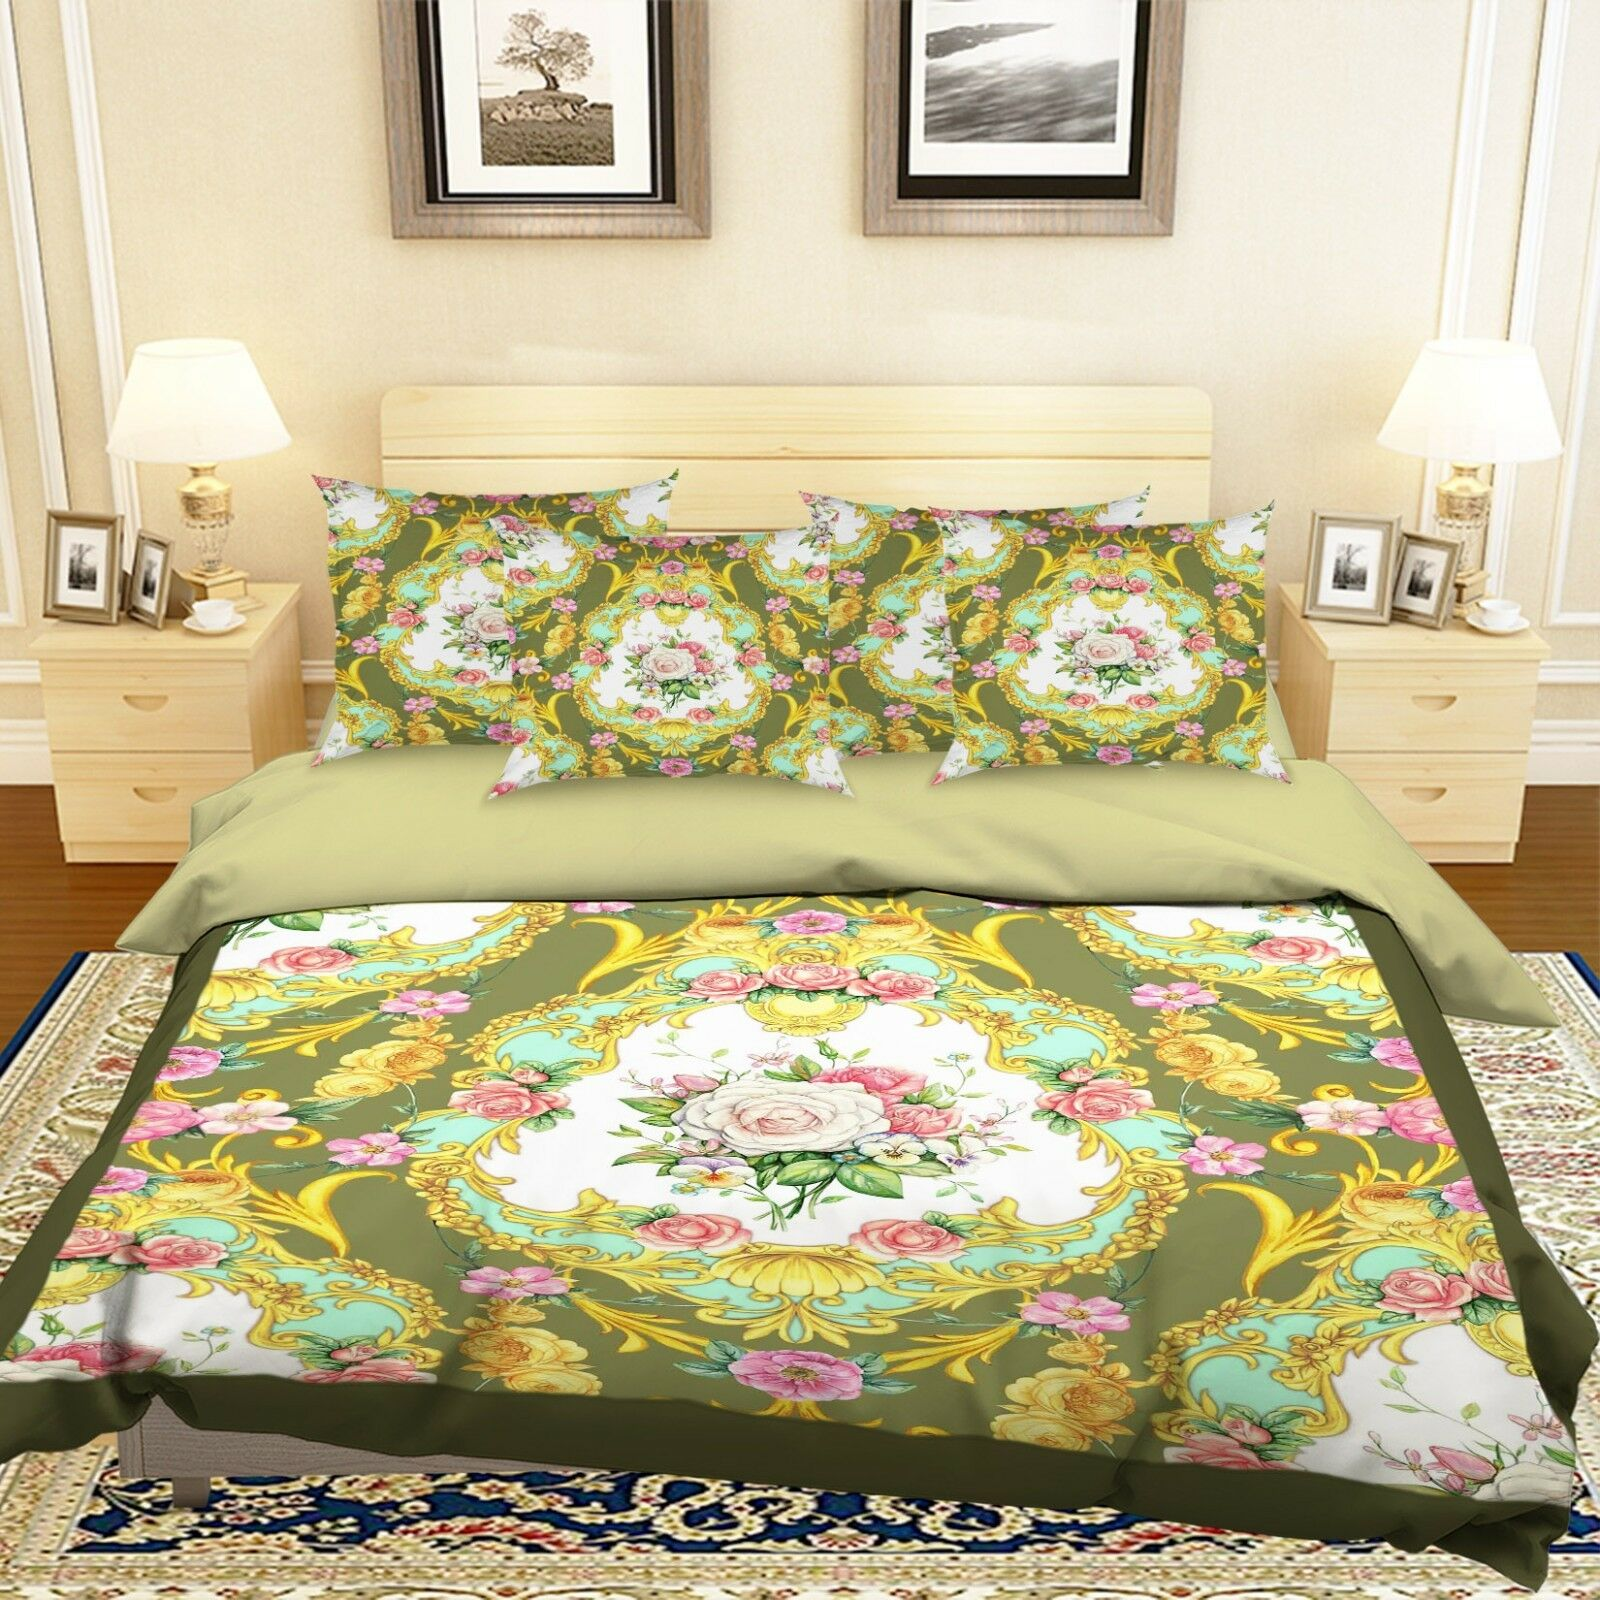 3D Flowers 1061 Bett Pillowcases Quilt Duvet Startseite Set Single Königin König Größe AU